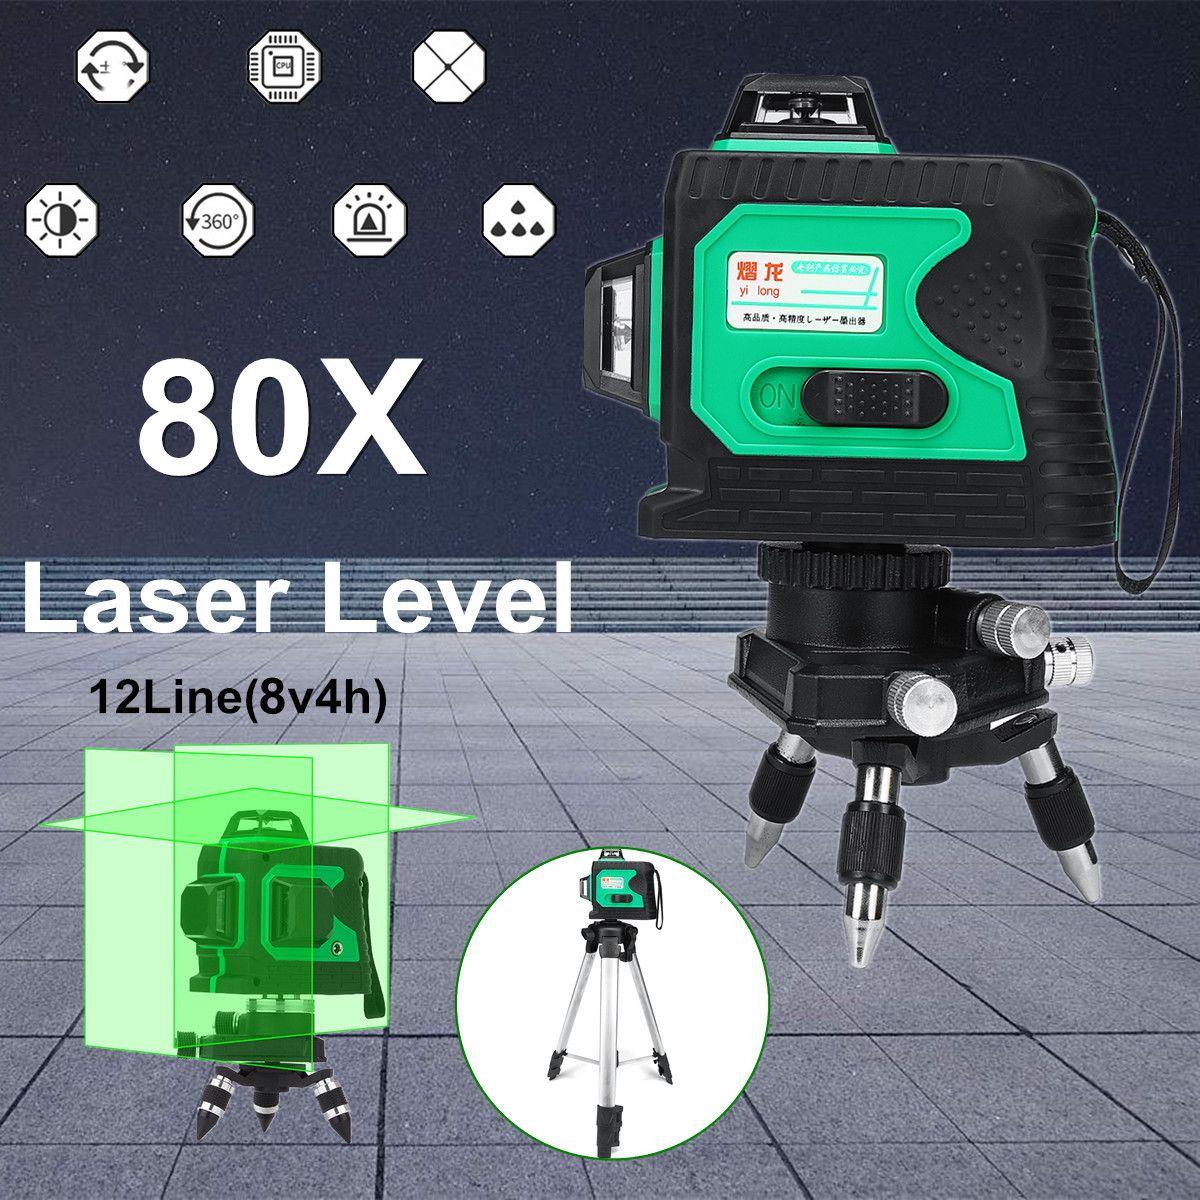 3D 12 Linie 360 Grad Laser Wasserdichte Auto Selbst Nivellierung mit Stativ Vertikale Horizontale Level Cross GRÜN Plumb-punkt funktion